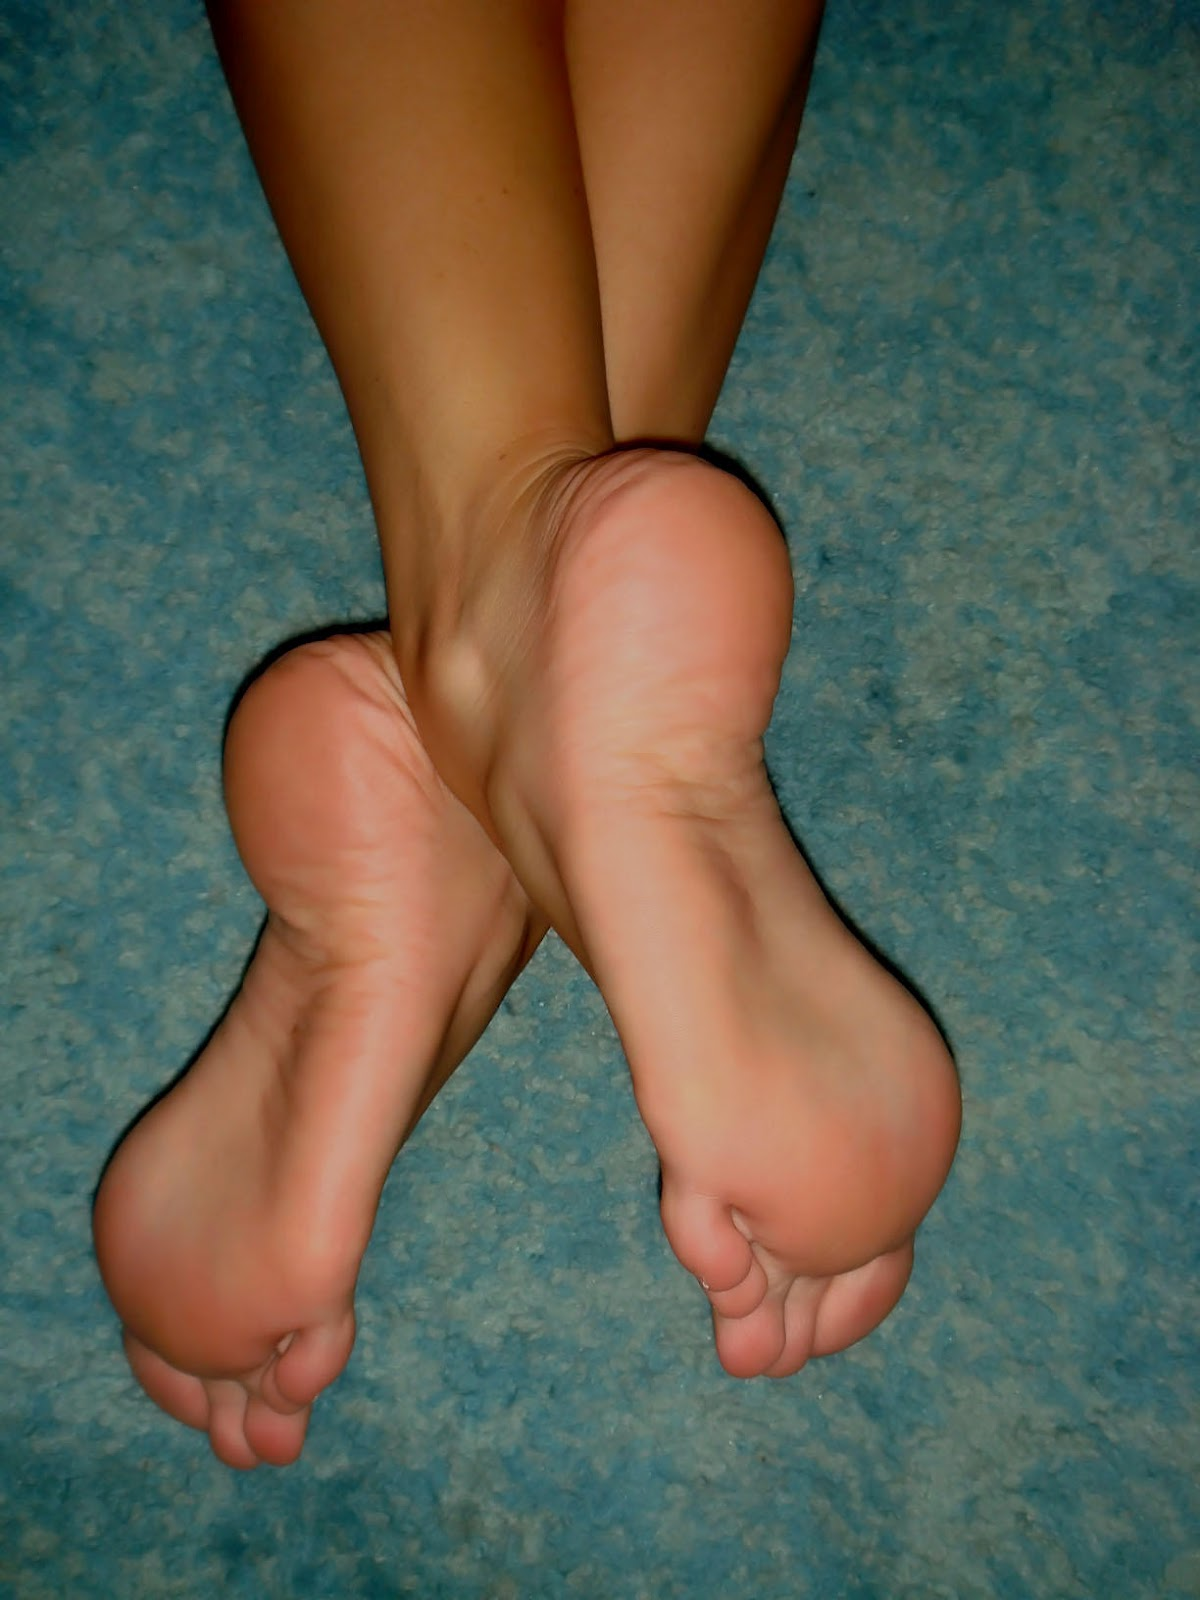 http://3.bp.blogspot.com/-mClRGnEPQHY/T-pD3rxJB2I/AAAAAAAABKQ/9t-ZJbYs0qo/s1600/women_feet_barefoot_desktop_1224x1632_wallpaper-364325.jpg